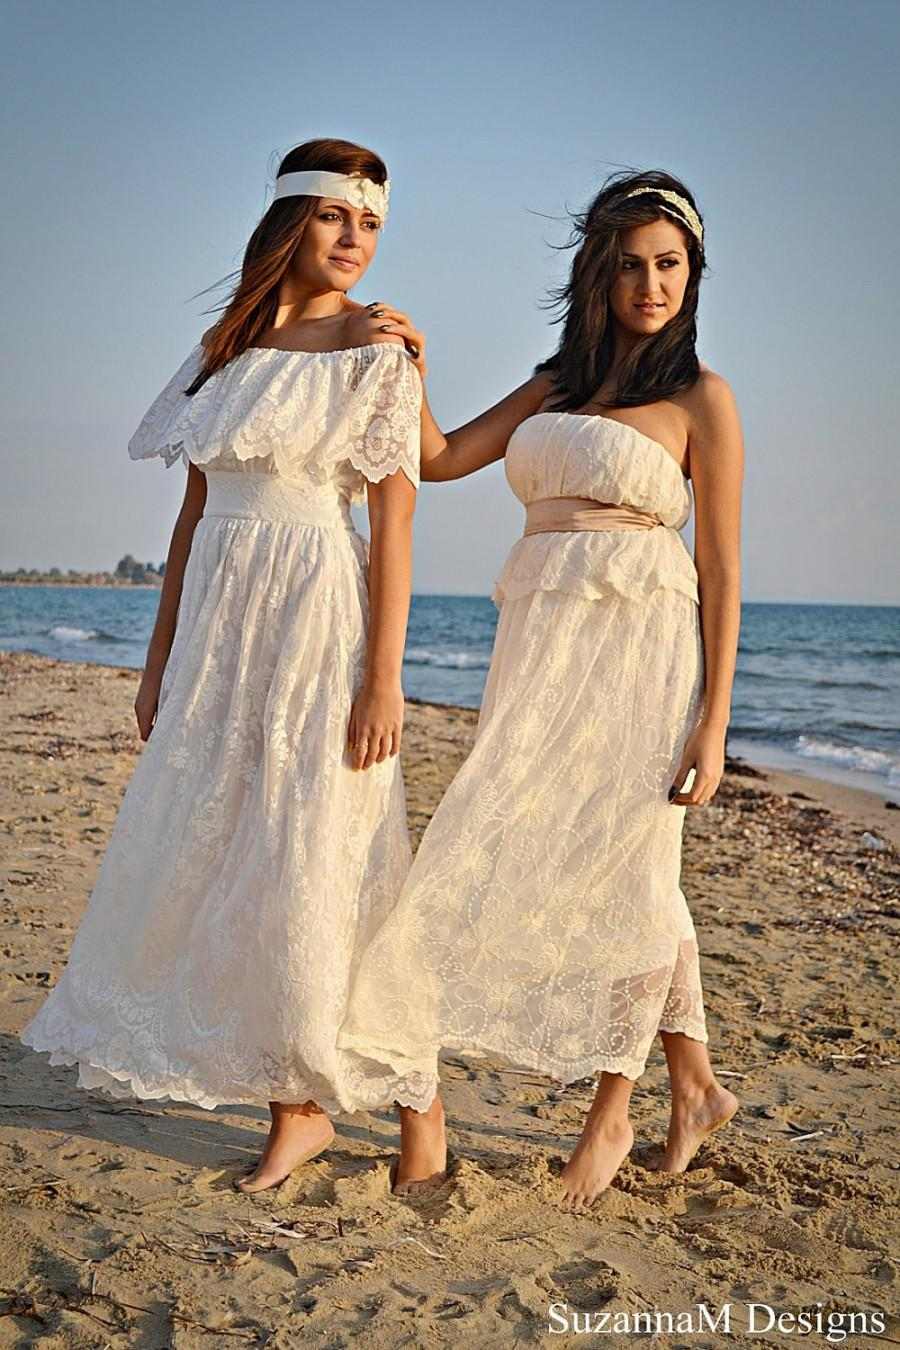 Свадьба - Boho Wedding Dress, Ivory Wedding Dress, Lace Wedding Dress, Vintage Wedding, Bohemian Gown,Gipsy Wedding Dress, Handmade, SuzannaMDesigns